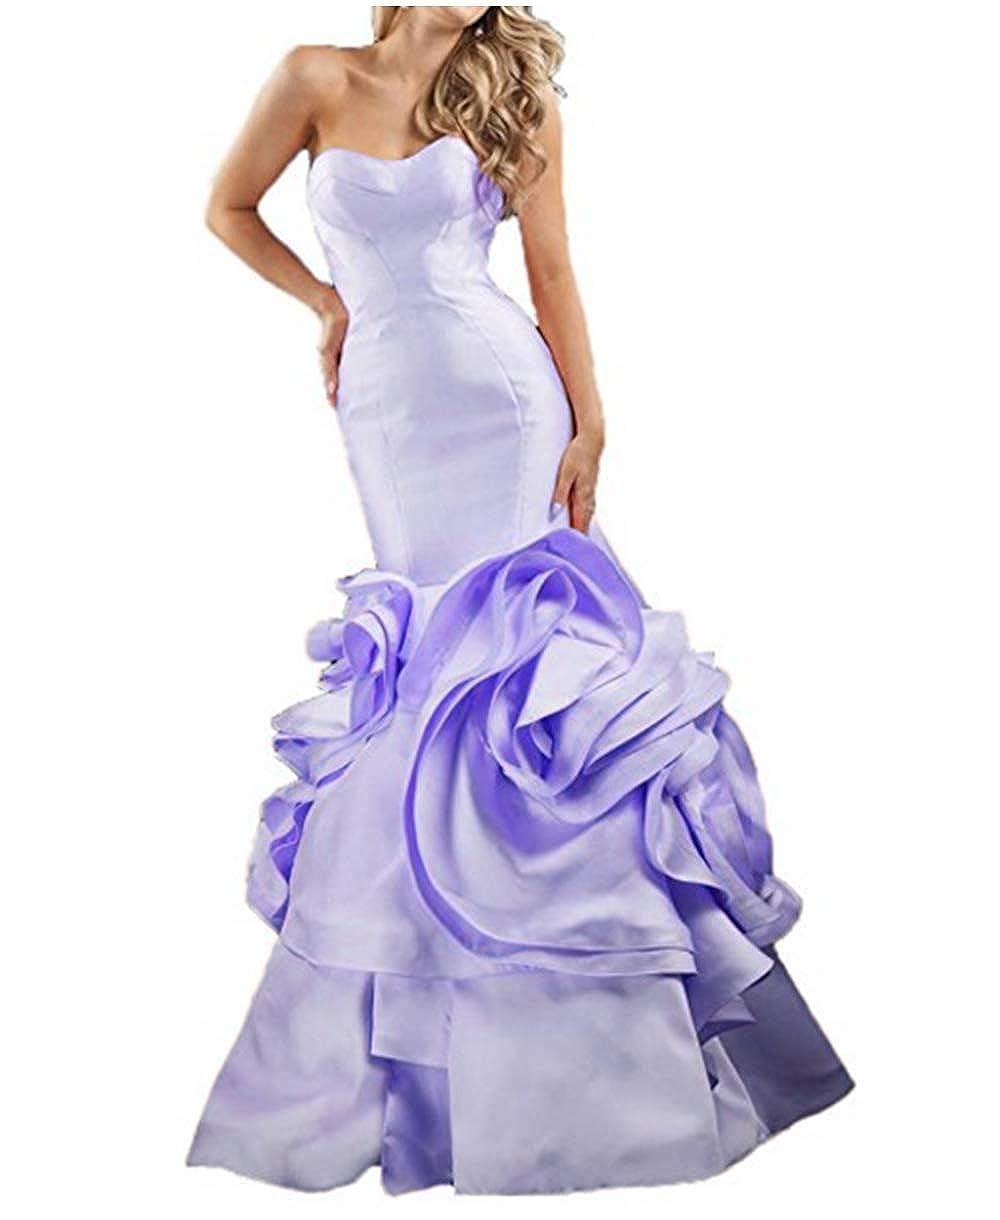 purplec FWVR Women's Sweetheart Ruffles Mermaid Formal Long Evening Prom Dresses